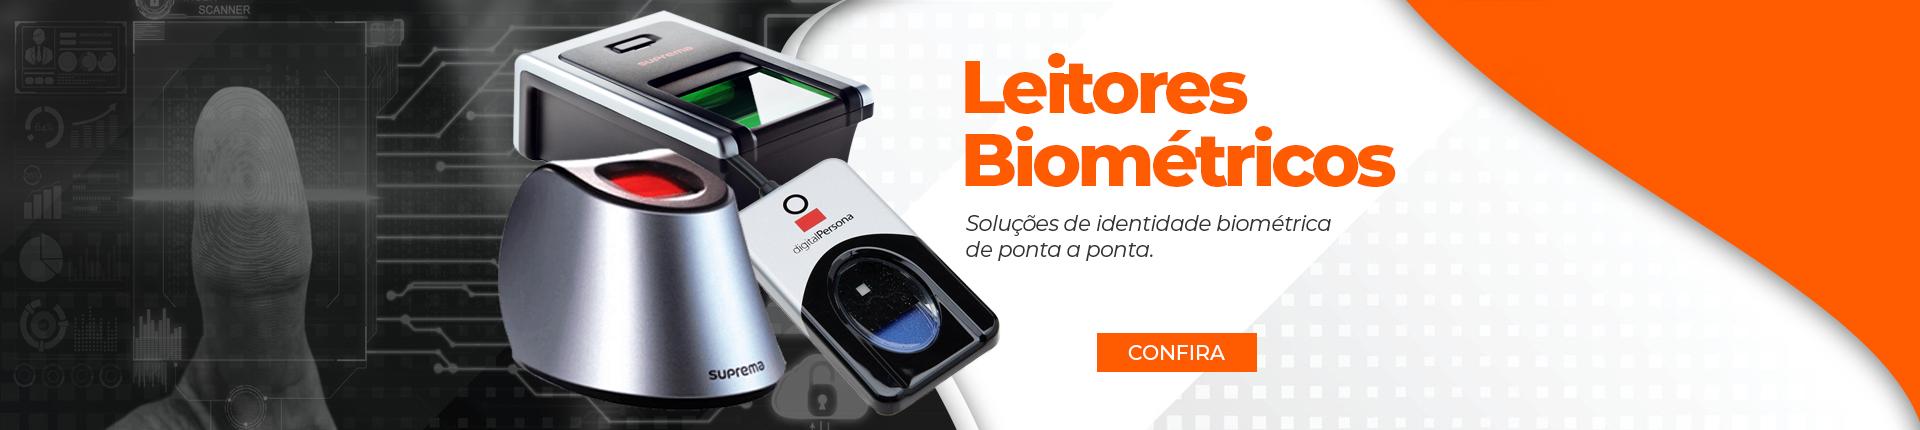 LDE - Leitores biométricos